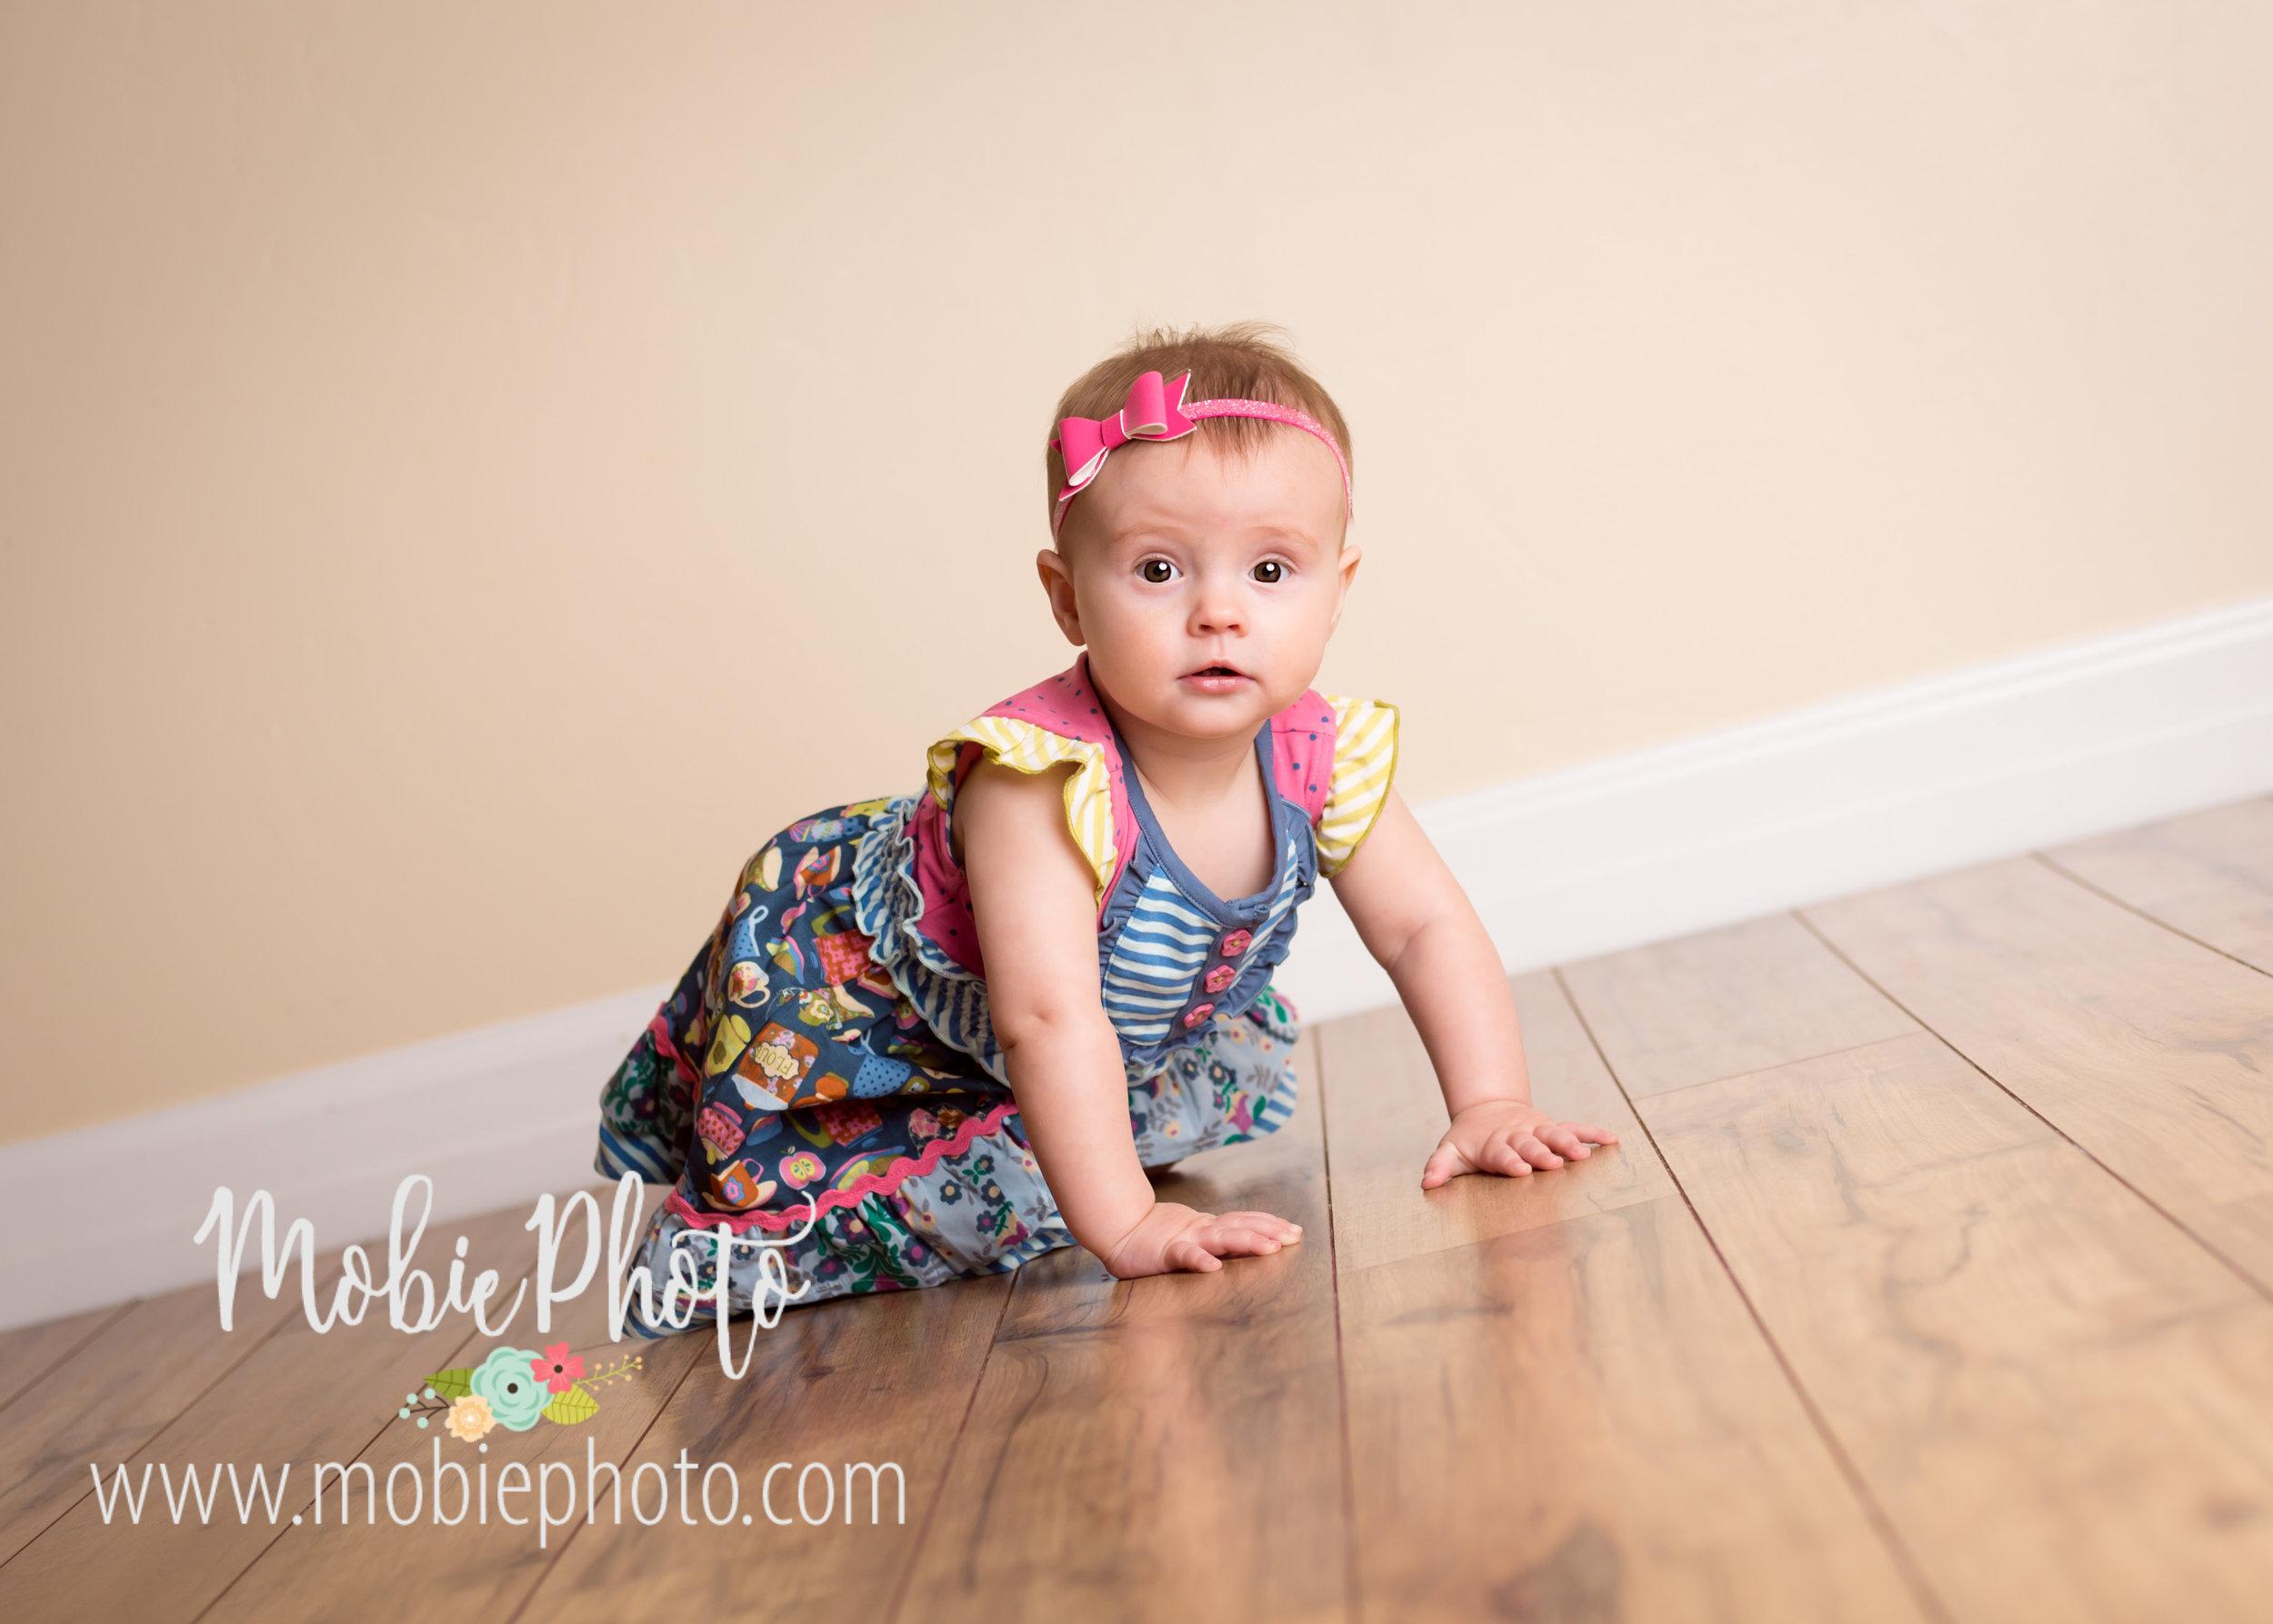 Mobie Photo - Lehi, Utah Baby Photographer - 9 Month Session